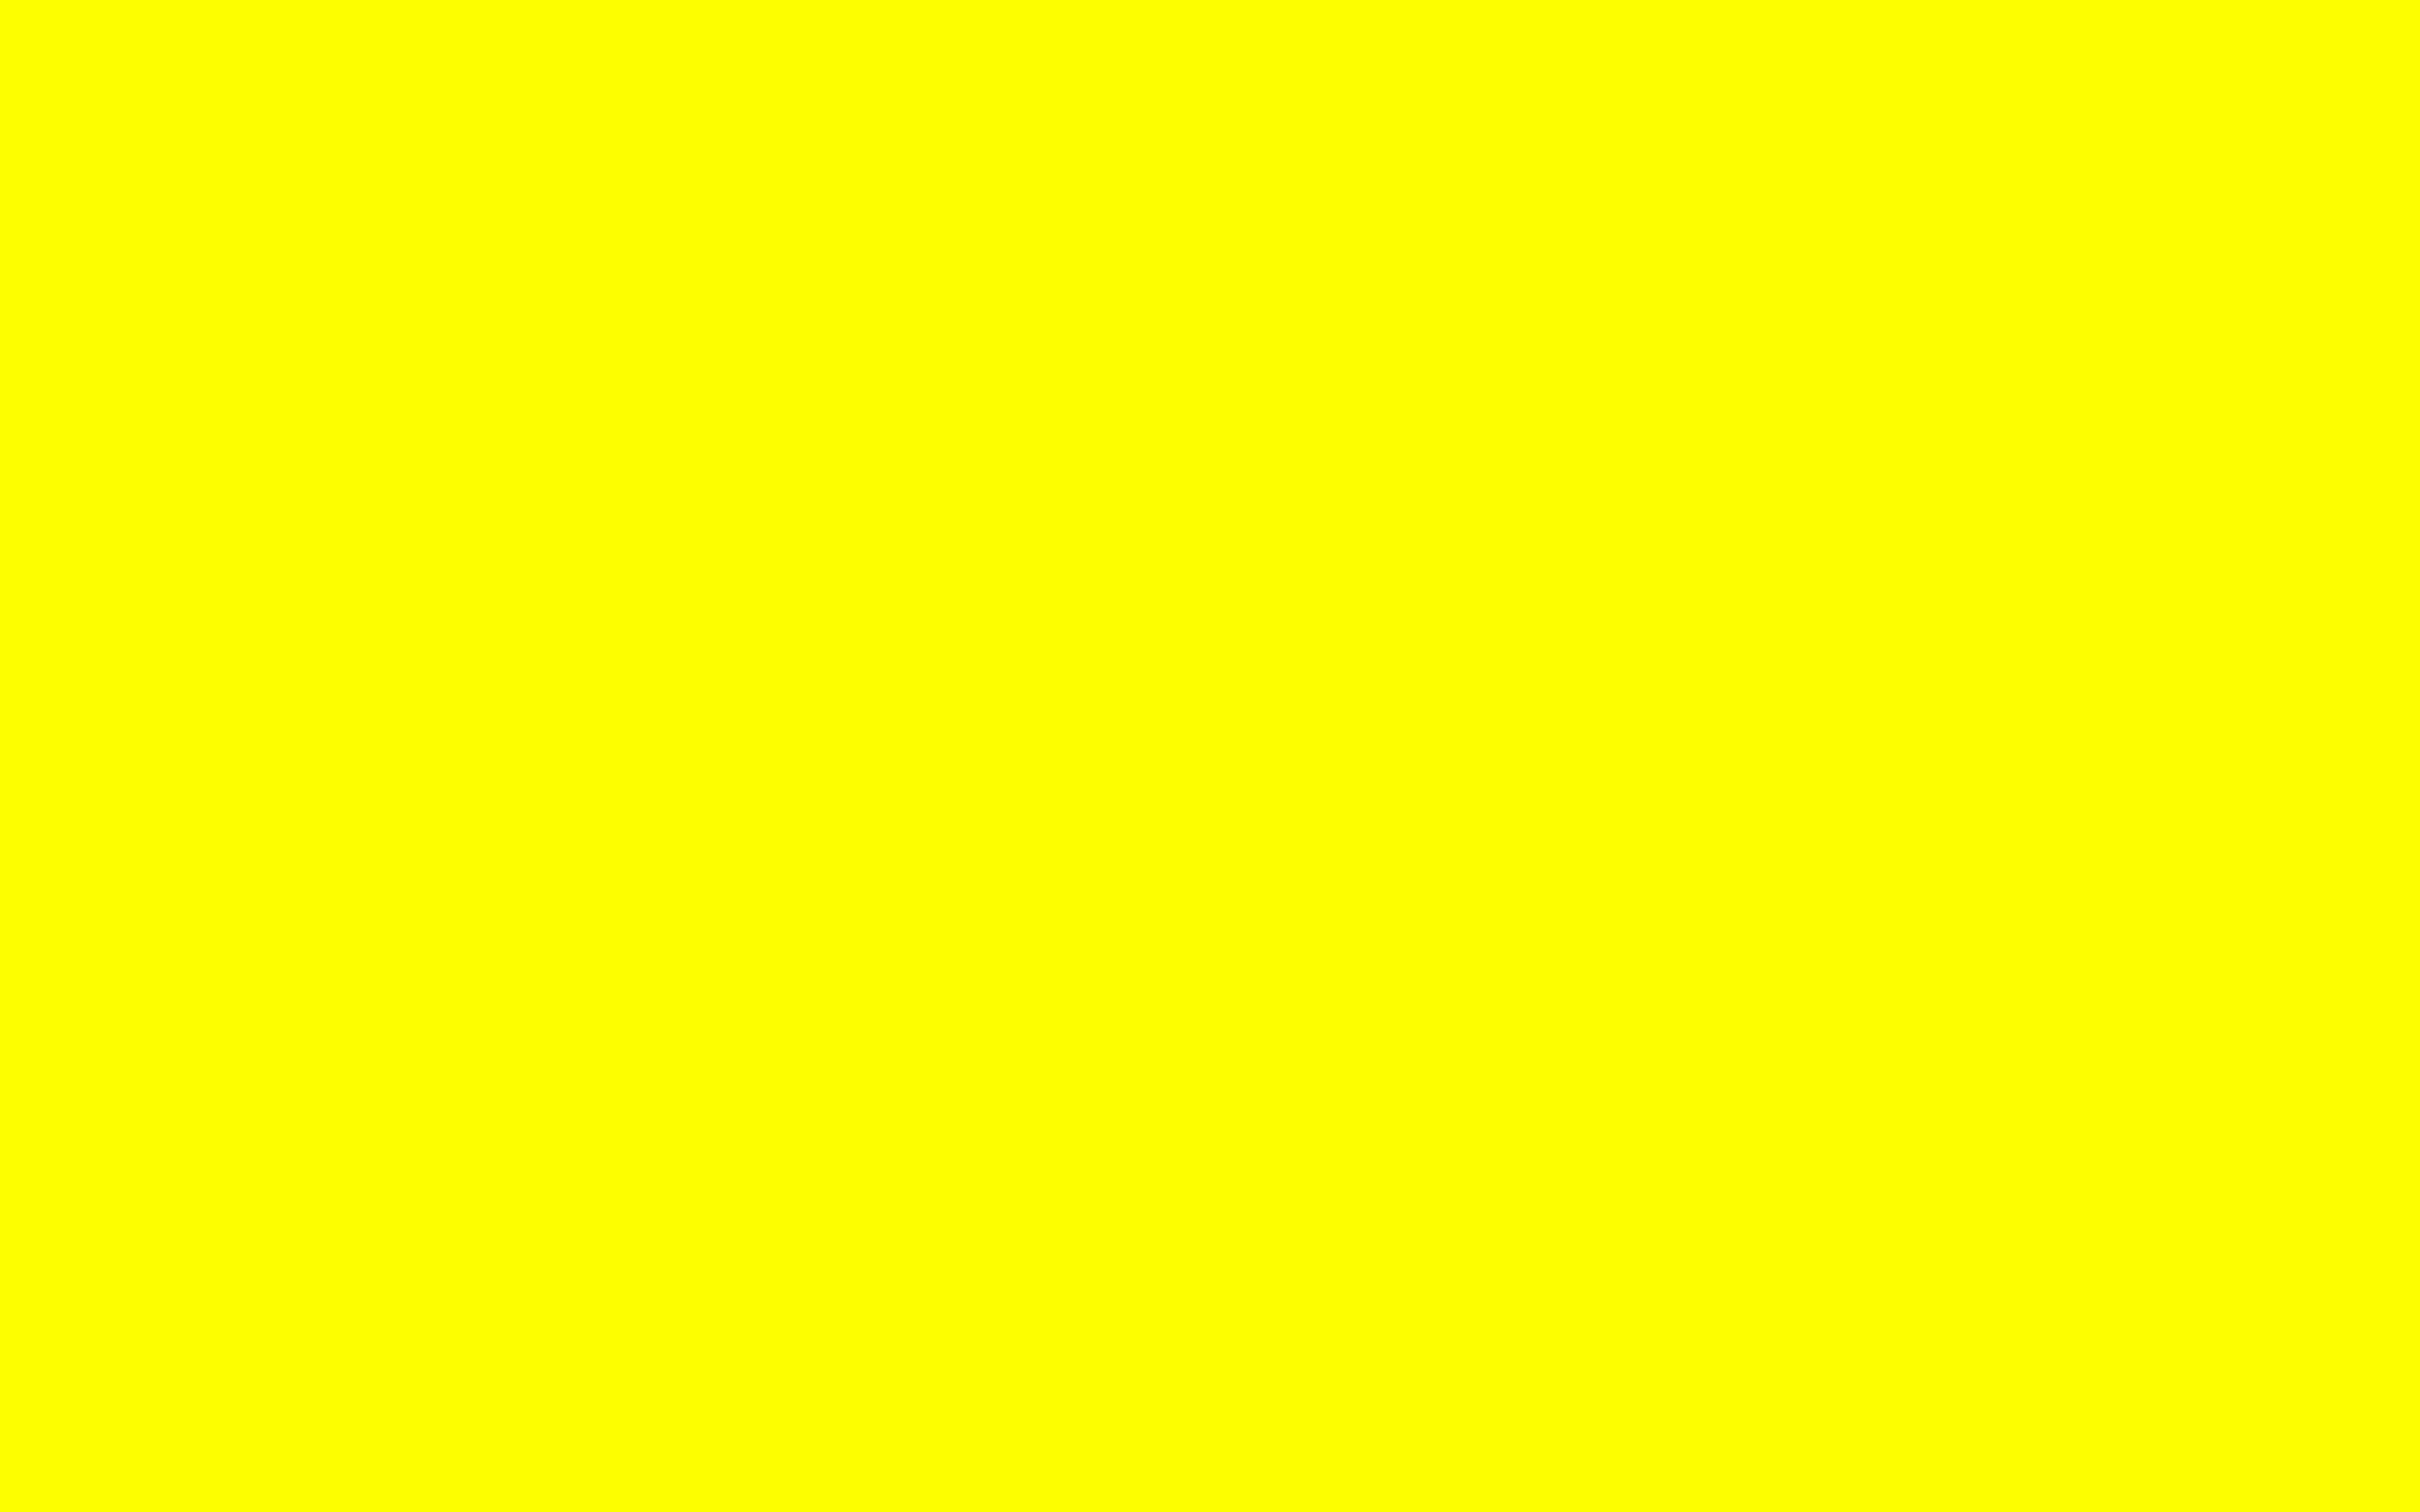 2560x1600 Lemon Glacier Solid Color Background